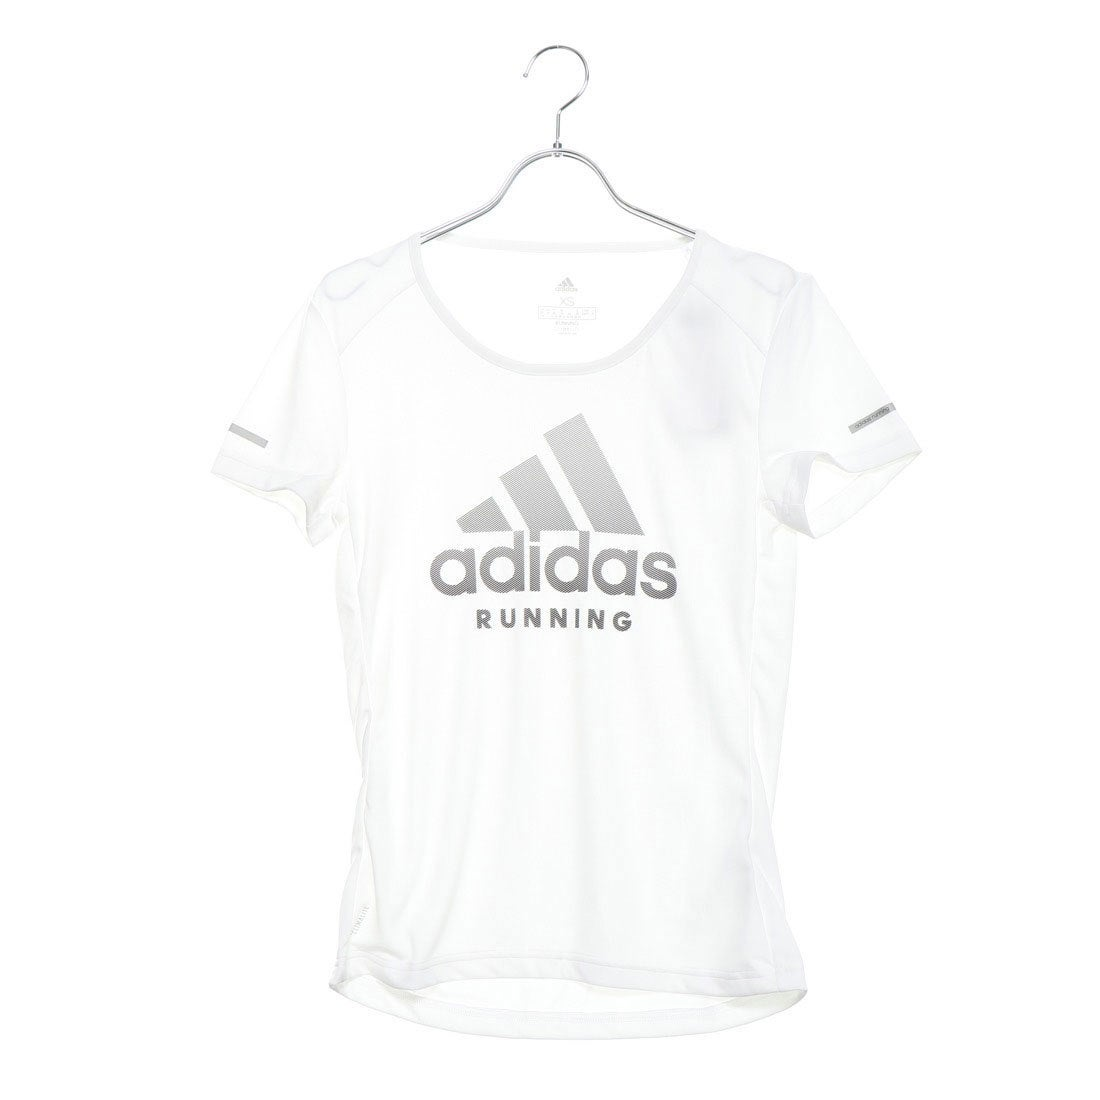 655319cf5d893 アディダス adidas レディース 陸上/ランニング 半袖Tシャツ RUN logo 半袖TシャツW EC5381 -レディースファッション通販  ロコンドガールズコレクション (ロココレ)